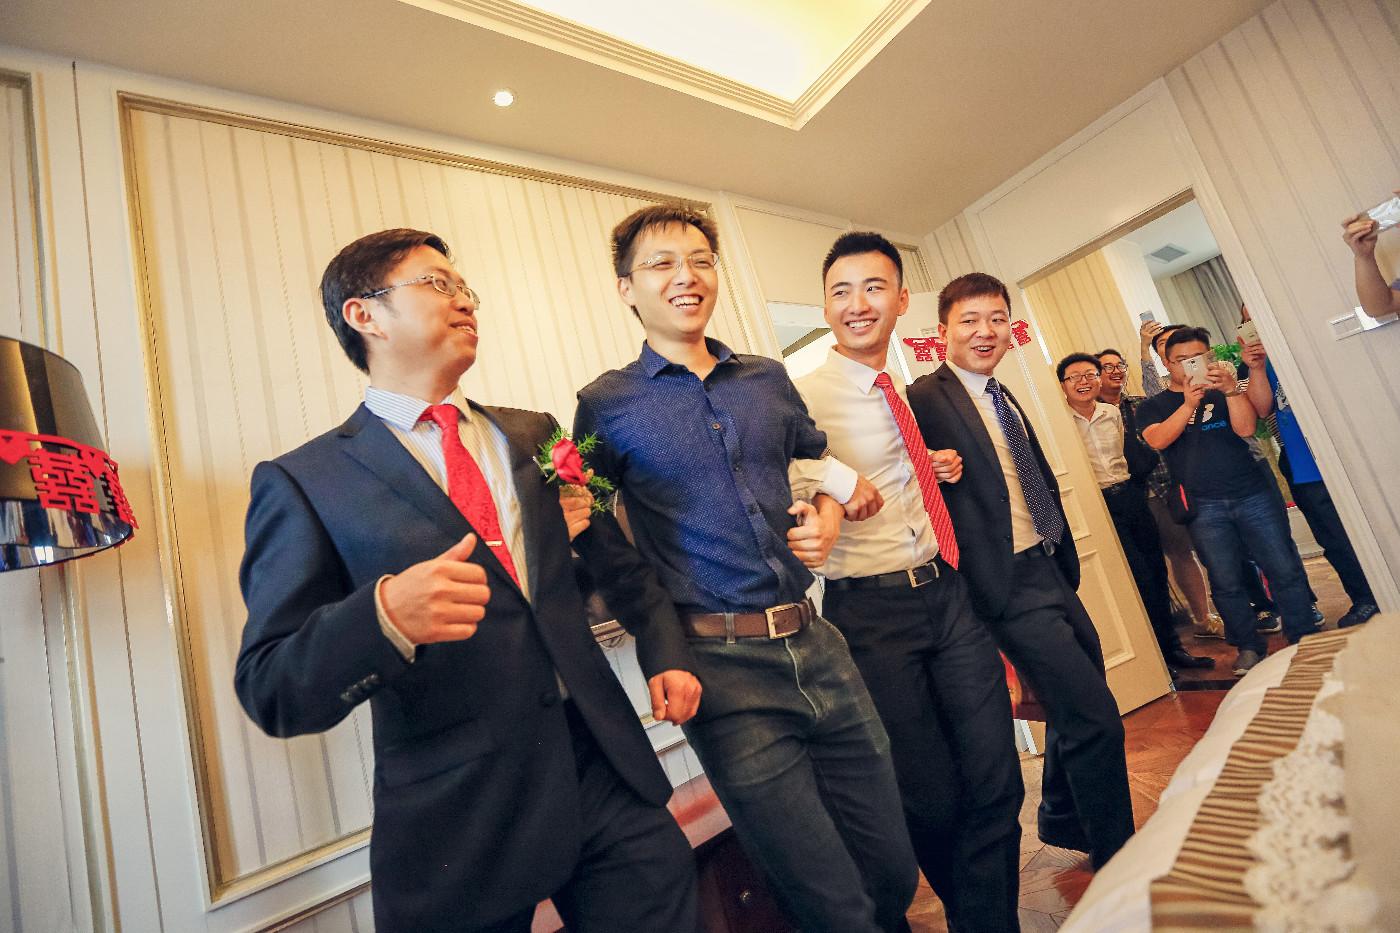 [KAI 婚礼纪实]安徽淮南T&Y16